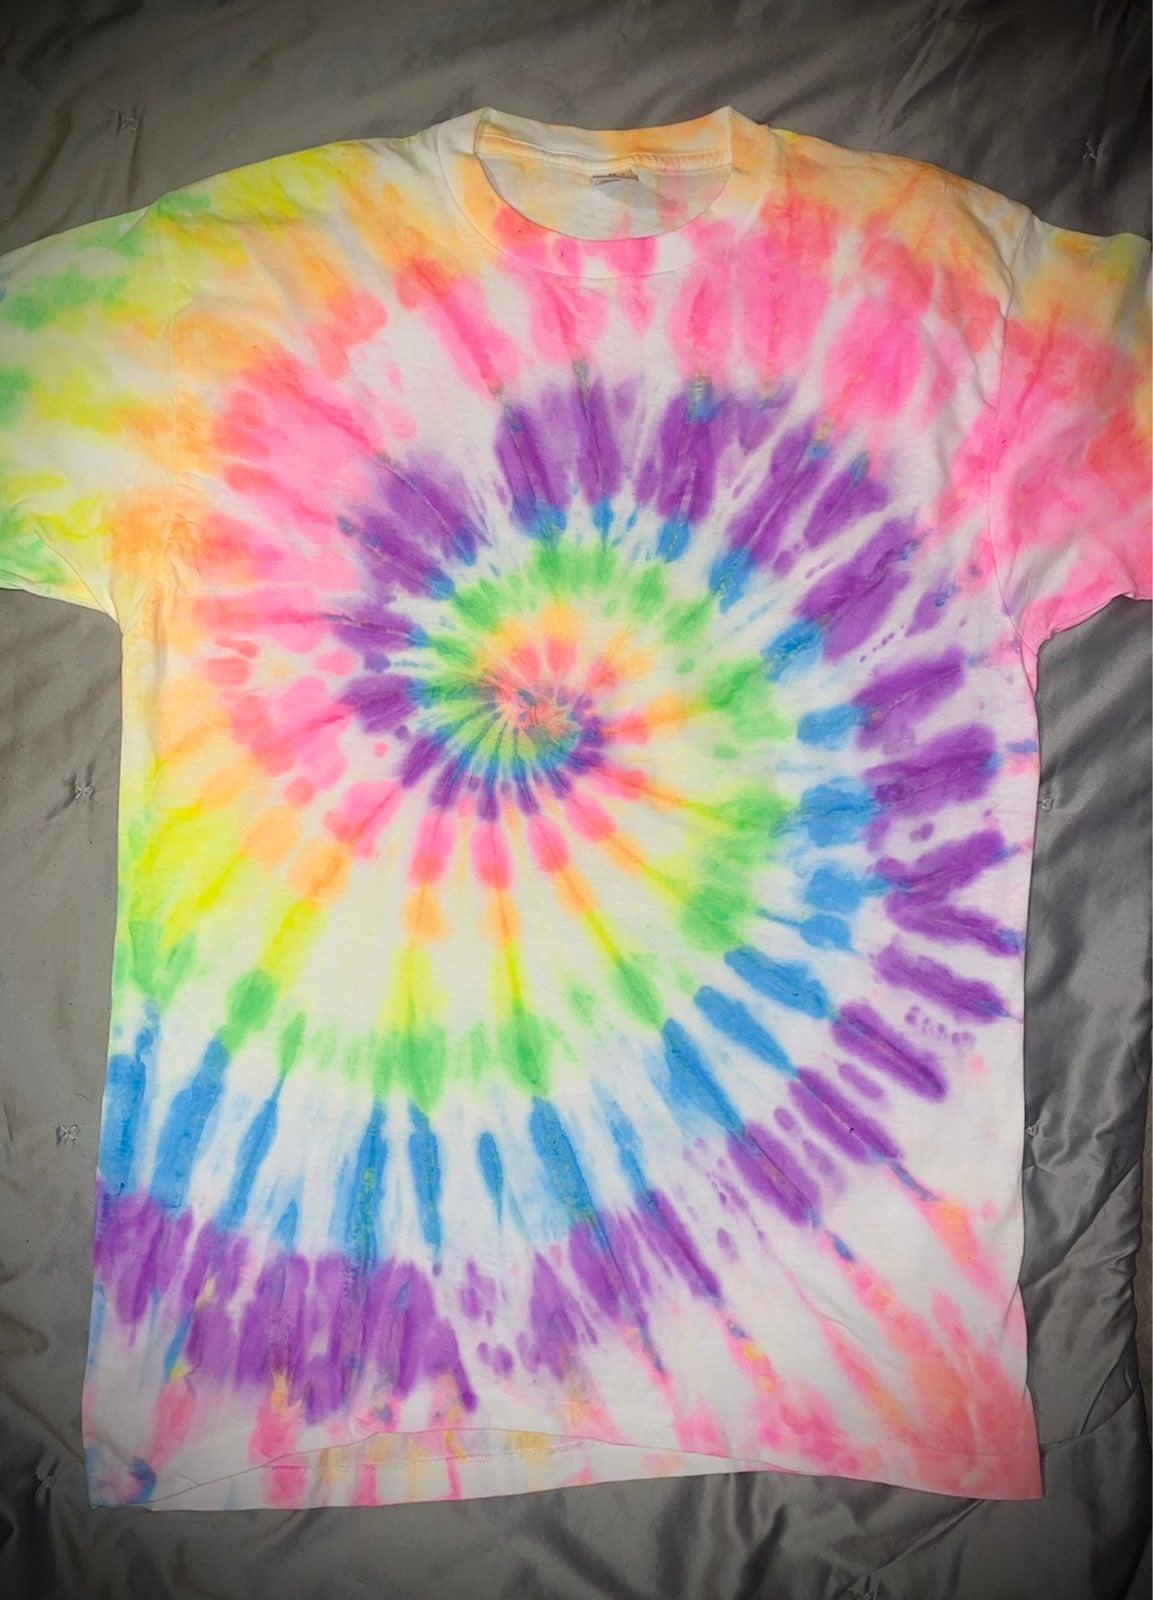 Large neon tyedye shirt